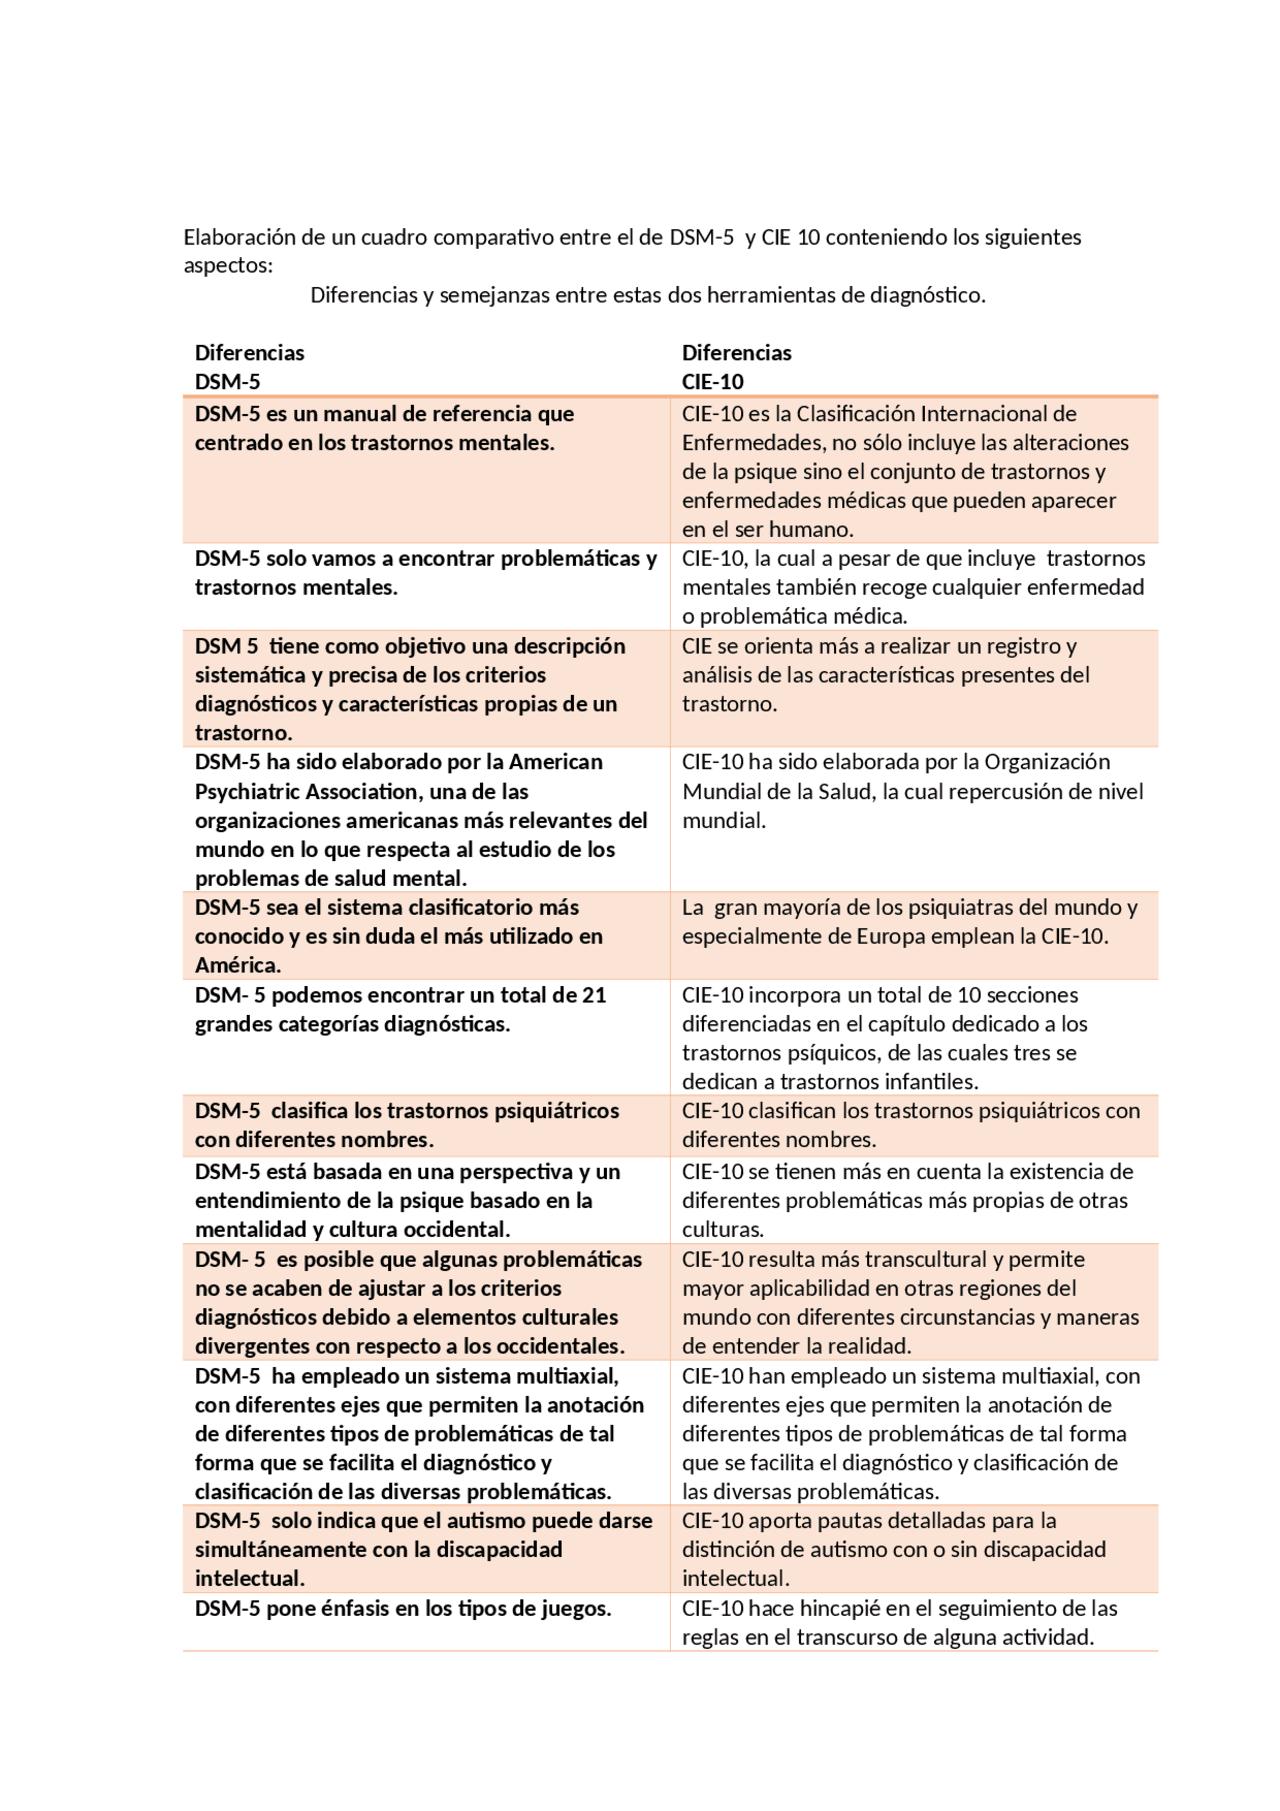 Diferencias Dsm 5 Diferencias Cie 10 Docsity